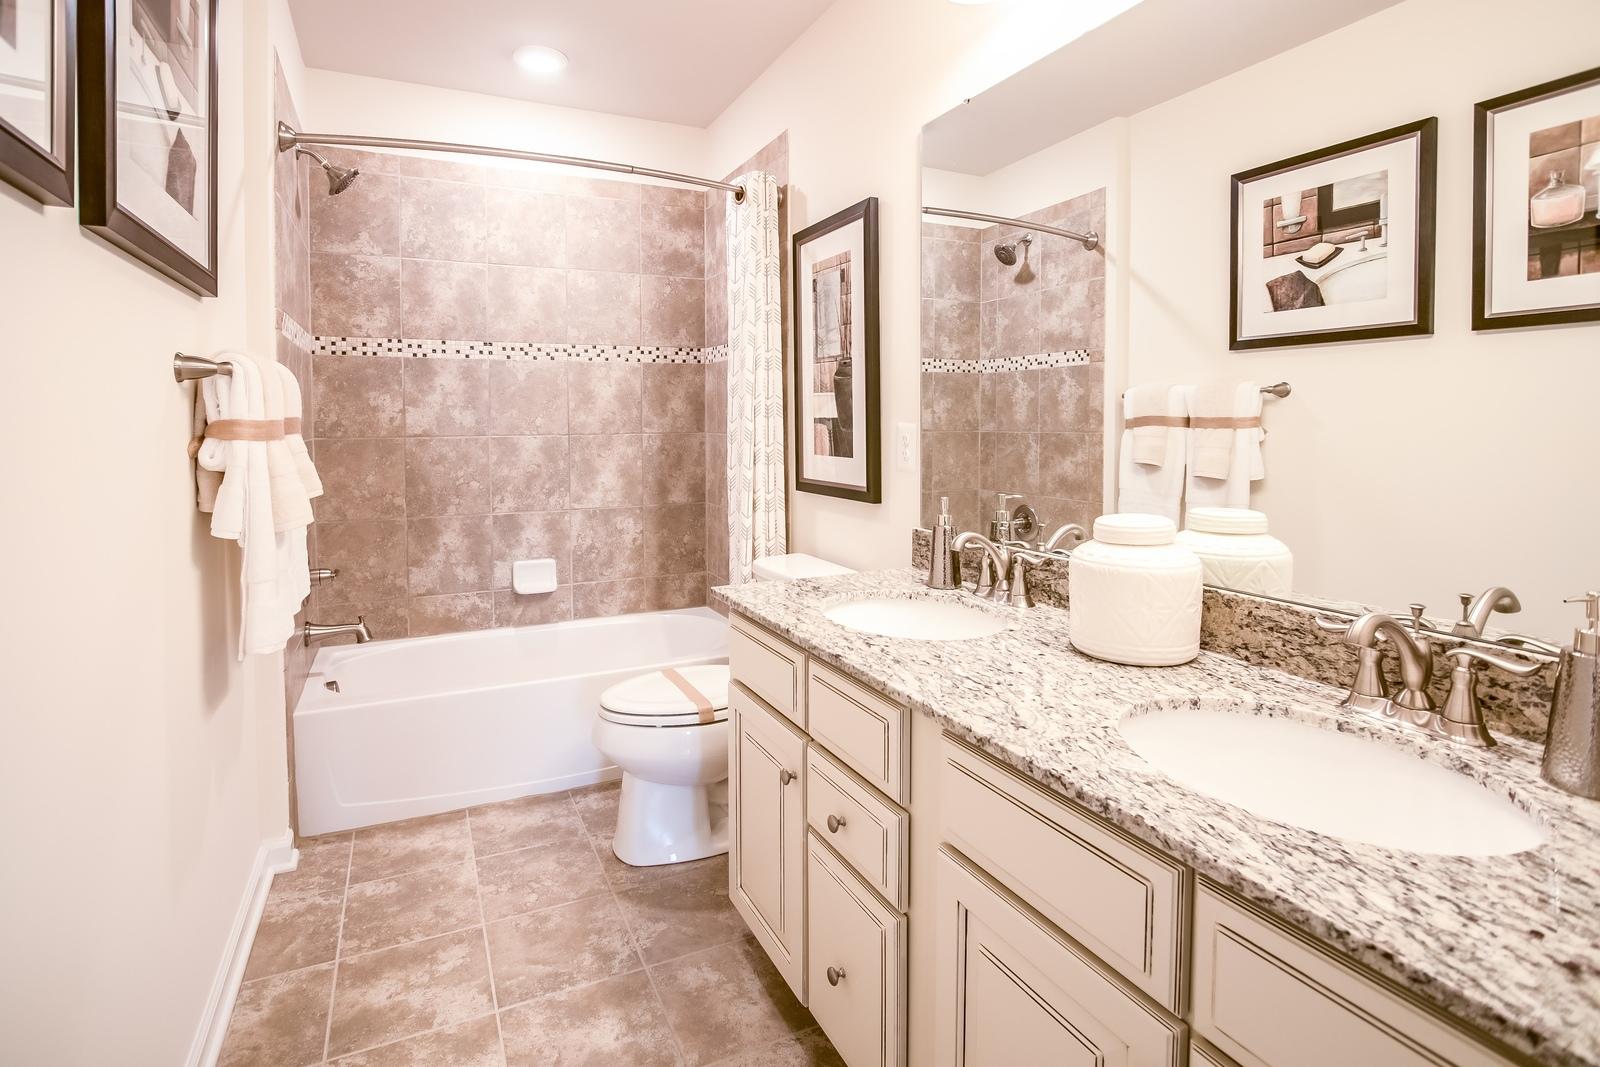 New Construction Single Family Homes For Sale Verona Ryan